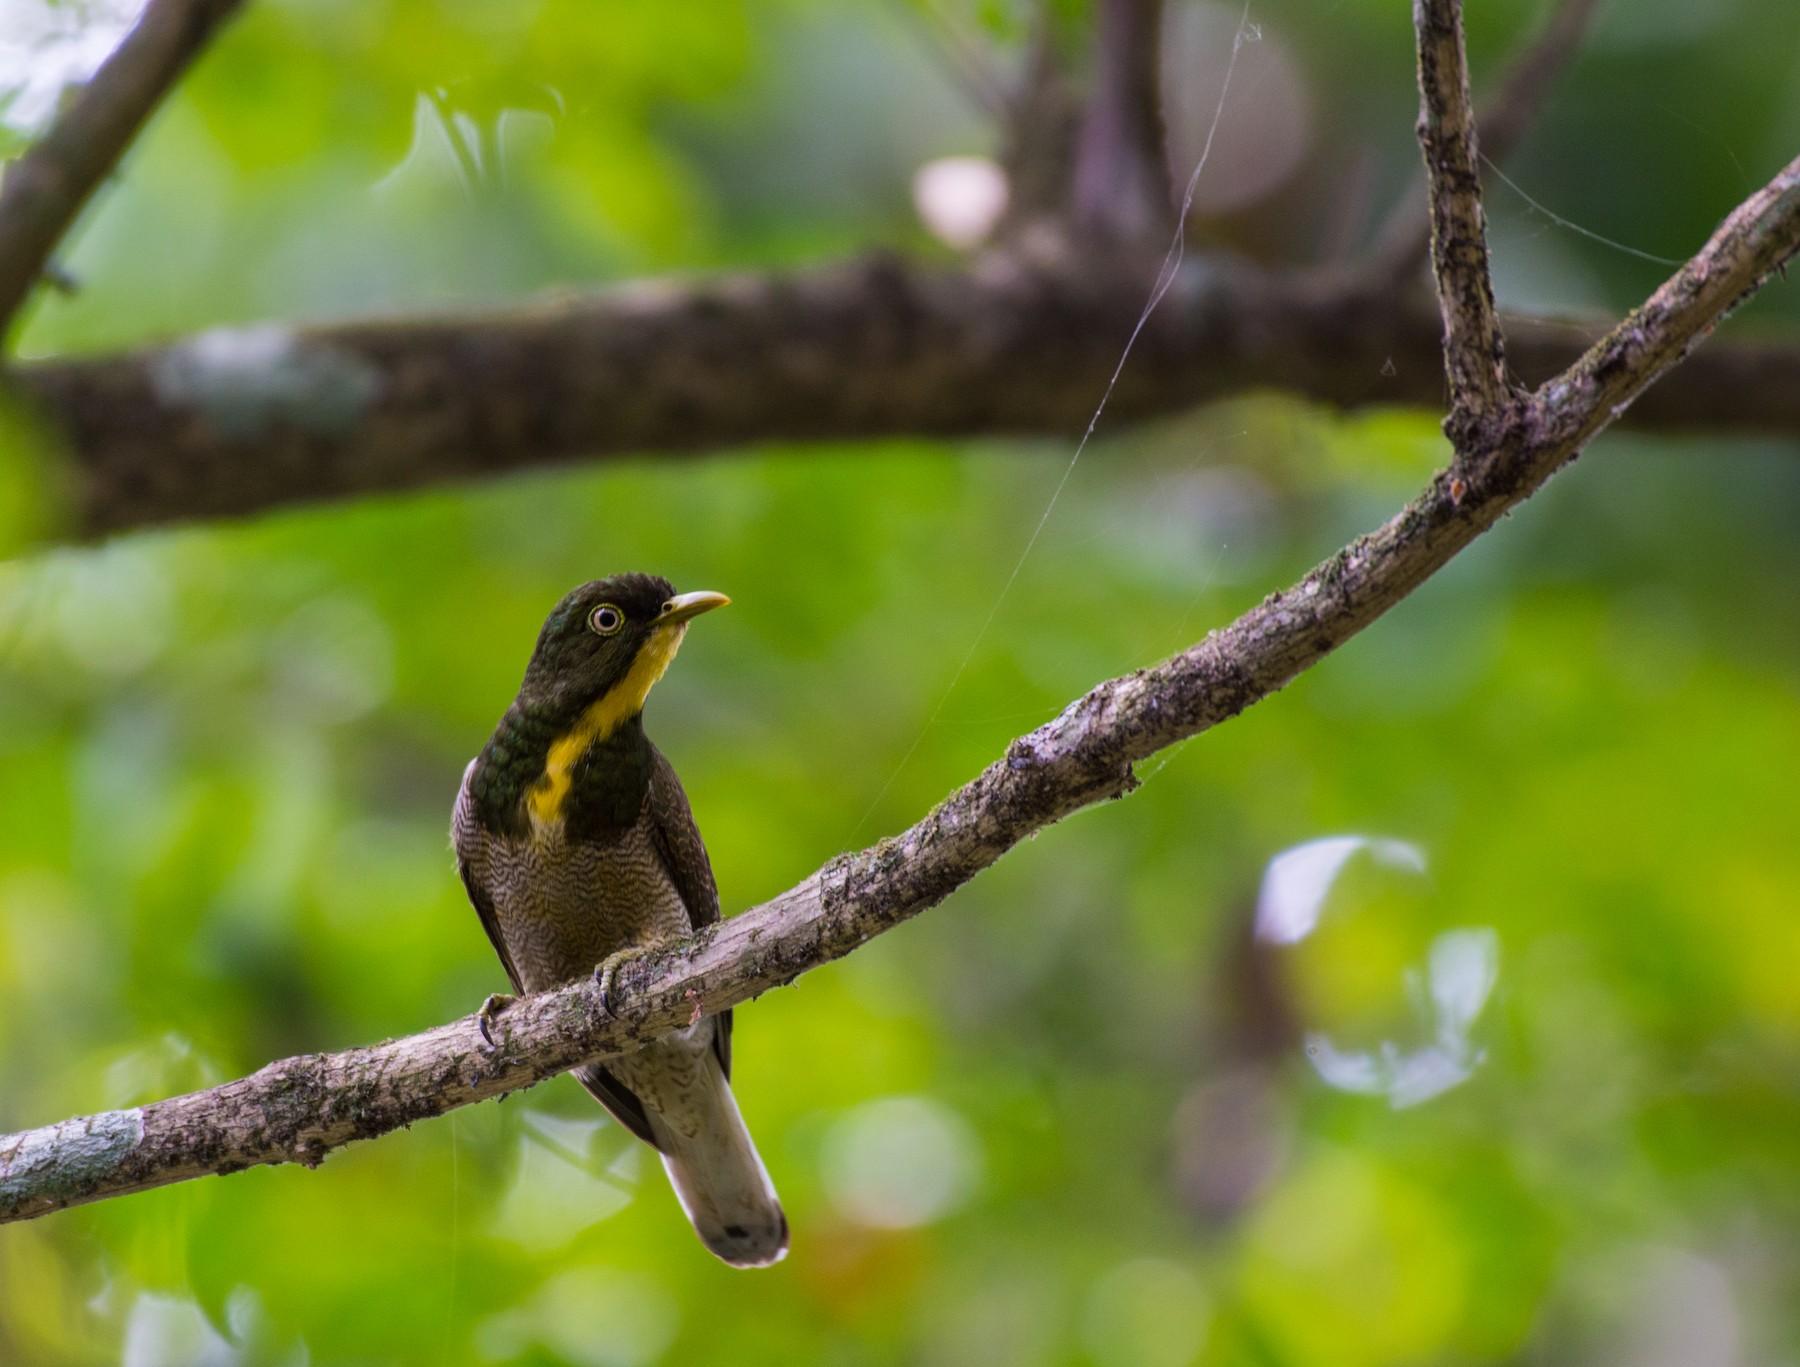 Yellow-throated Cuckoo - Aaron Kortenhoven